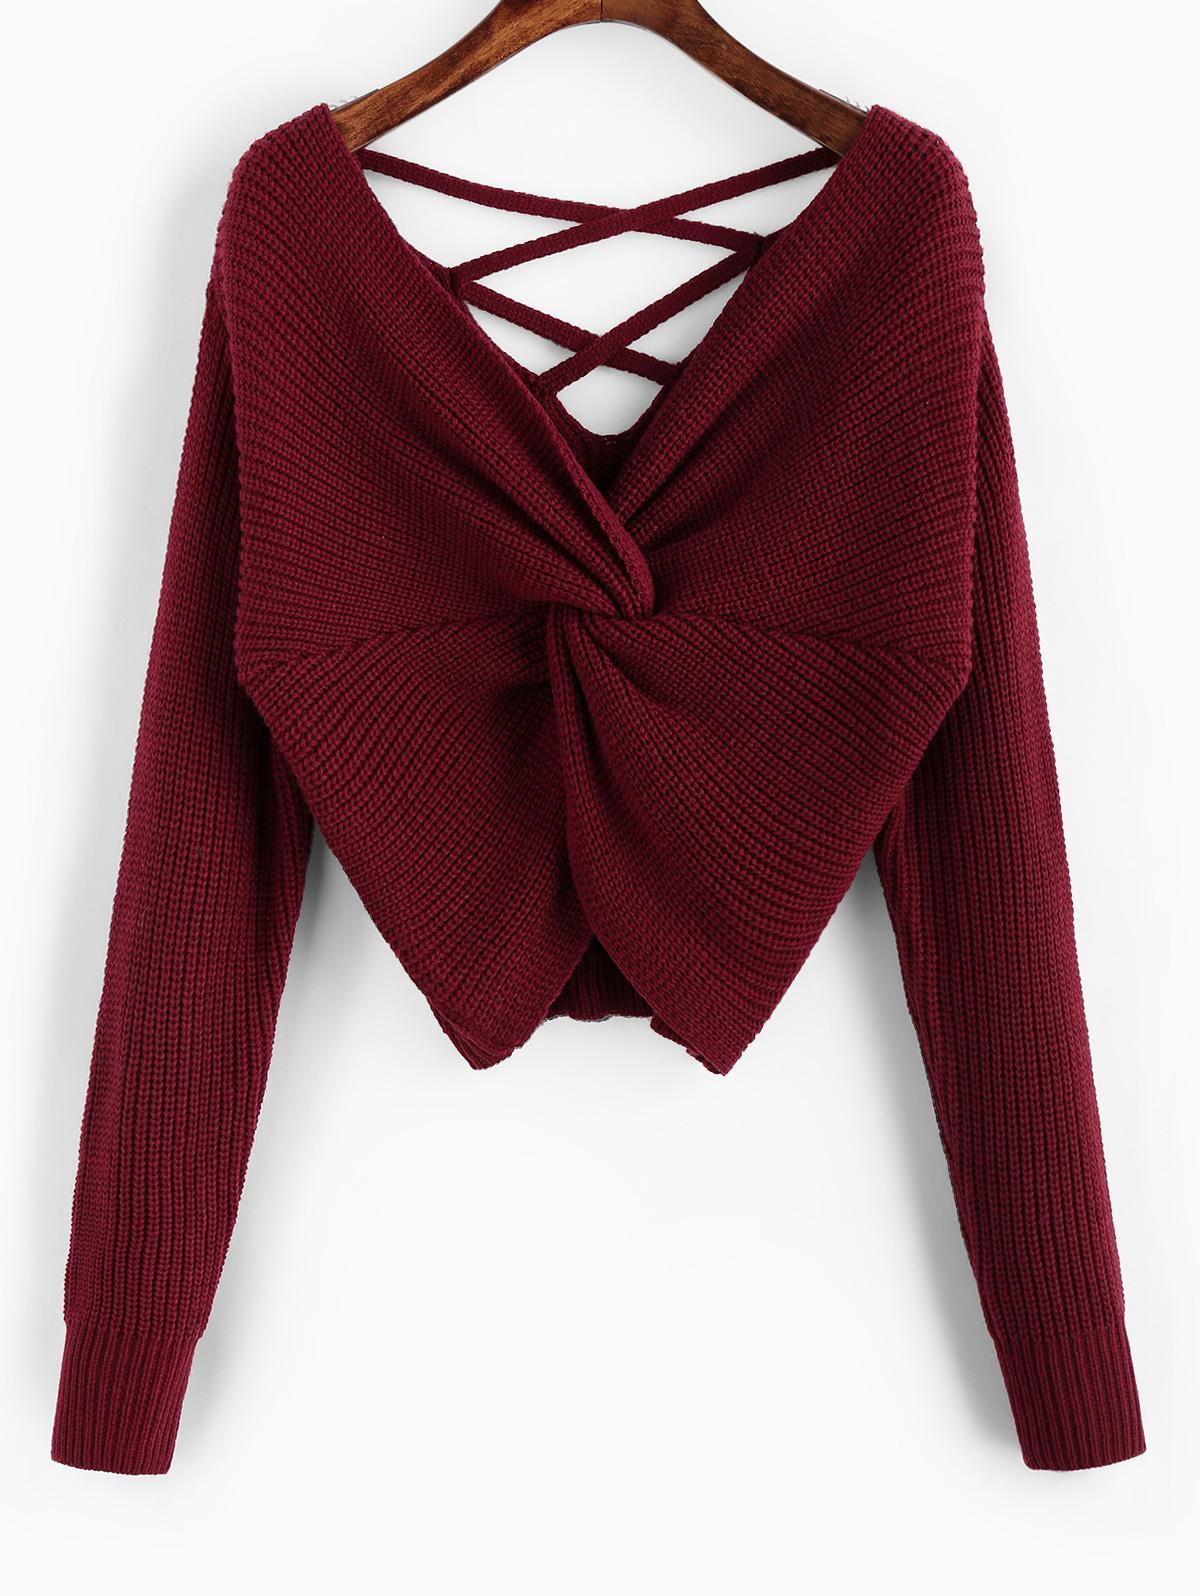 ZAFUL Twisted Criss Cross Drop Shoulder Sweater